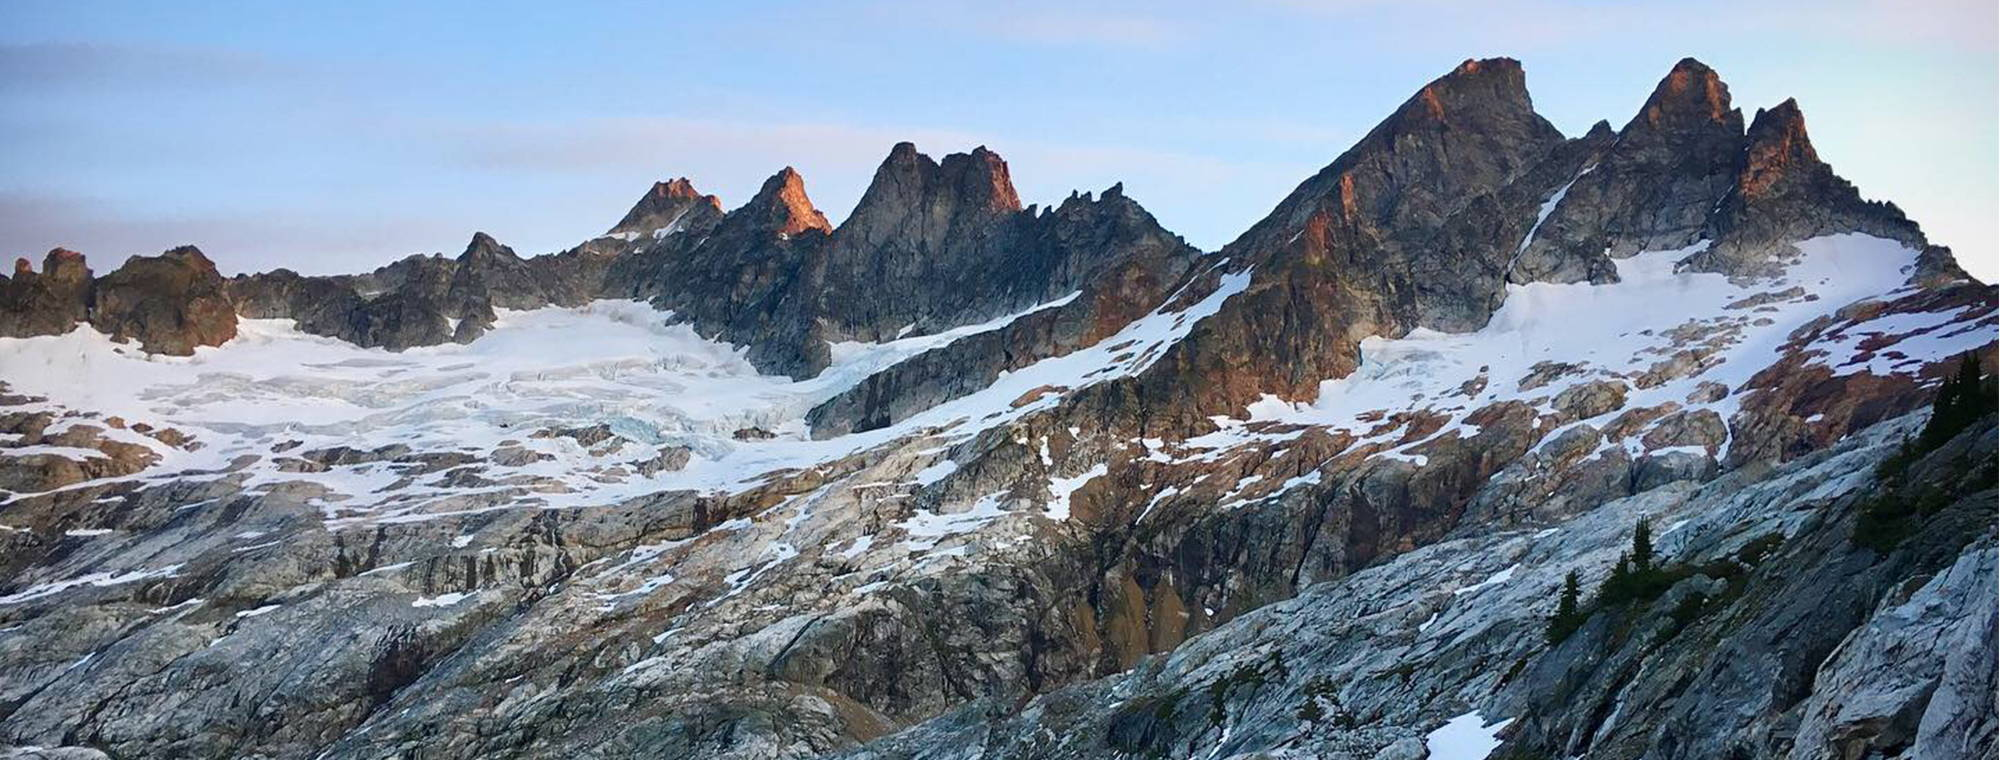 NW Alpine Ambassador Theresa Silveyra North Cascades Landscape